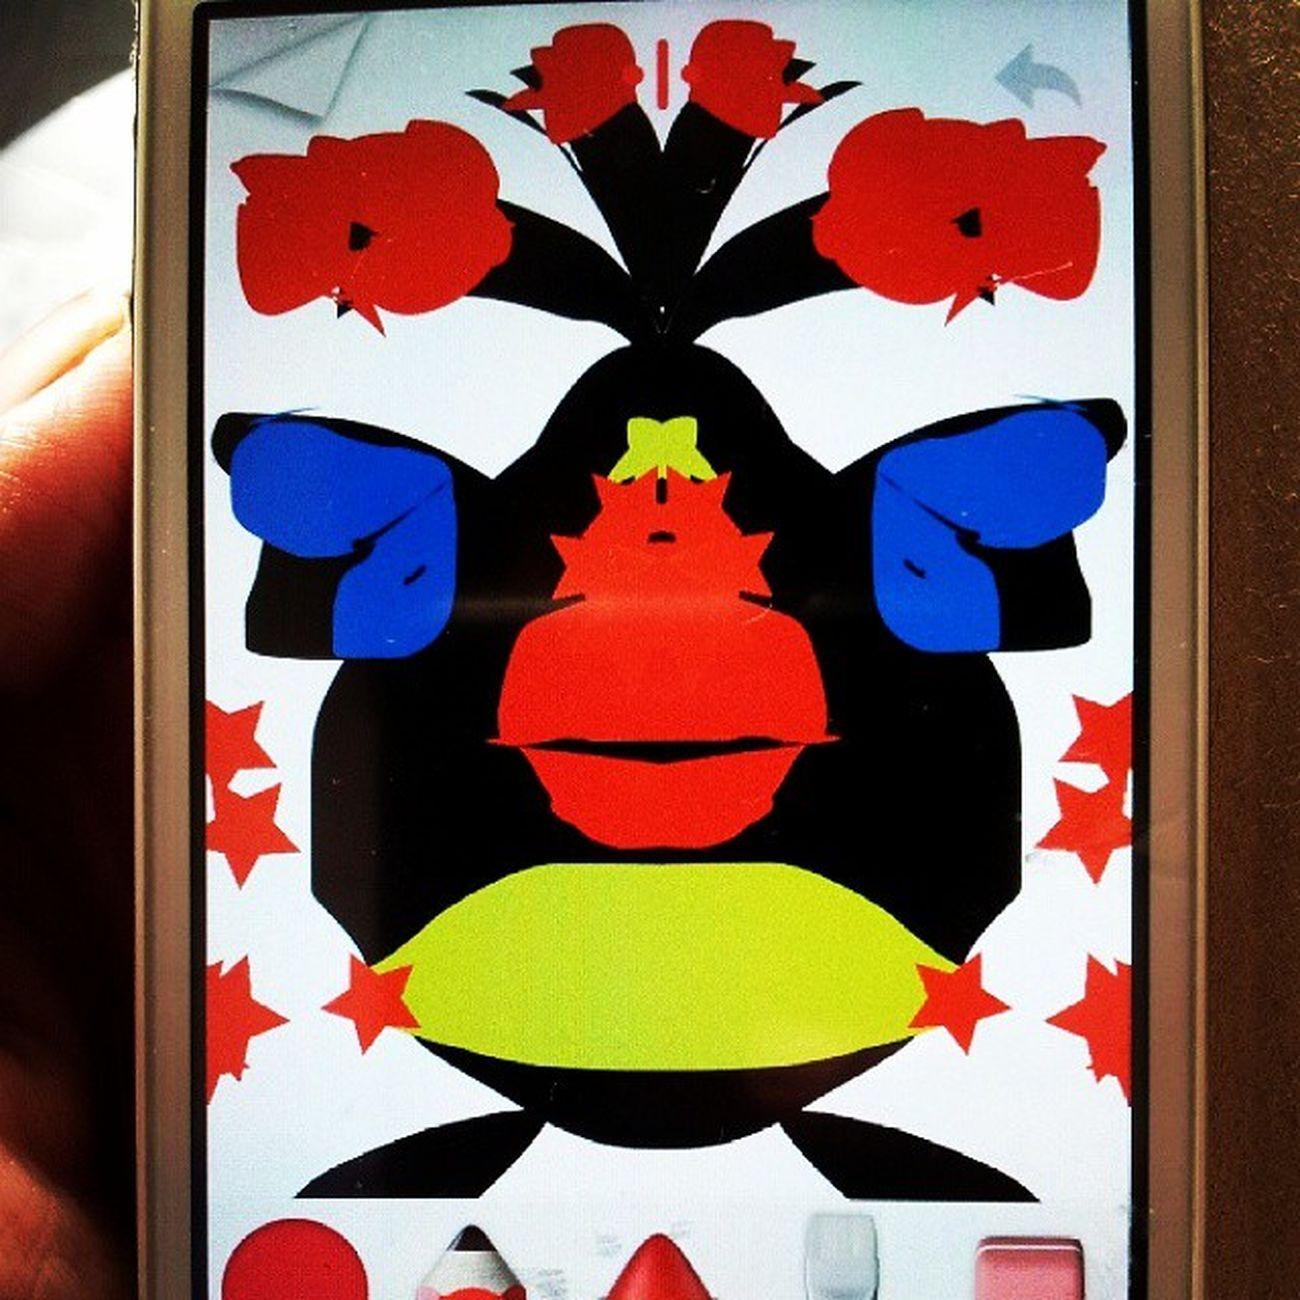 New Post ANGRY BiRD by My Son Aditya :) ♥ Art ArtWork Drawing Painting Illustration Sketch Youngartist Kidsartist Angrybirds IPhone Digitalart  Kids Young Artist Love Myson Lovemyson ♥ ;)